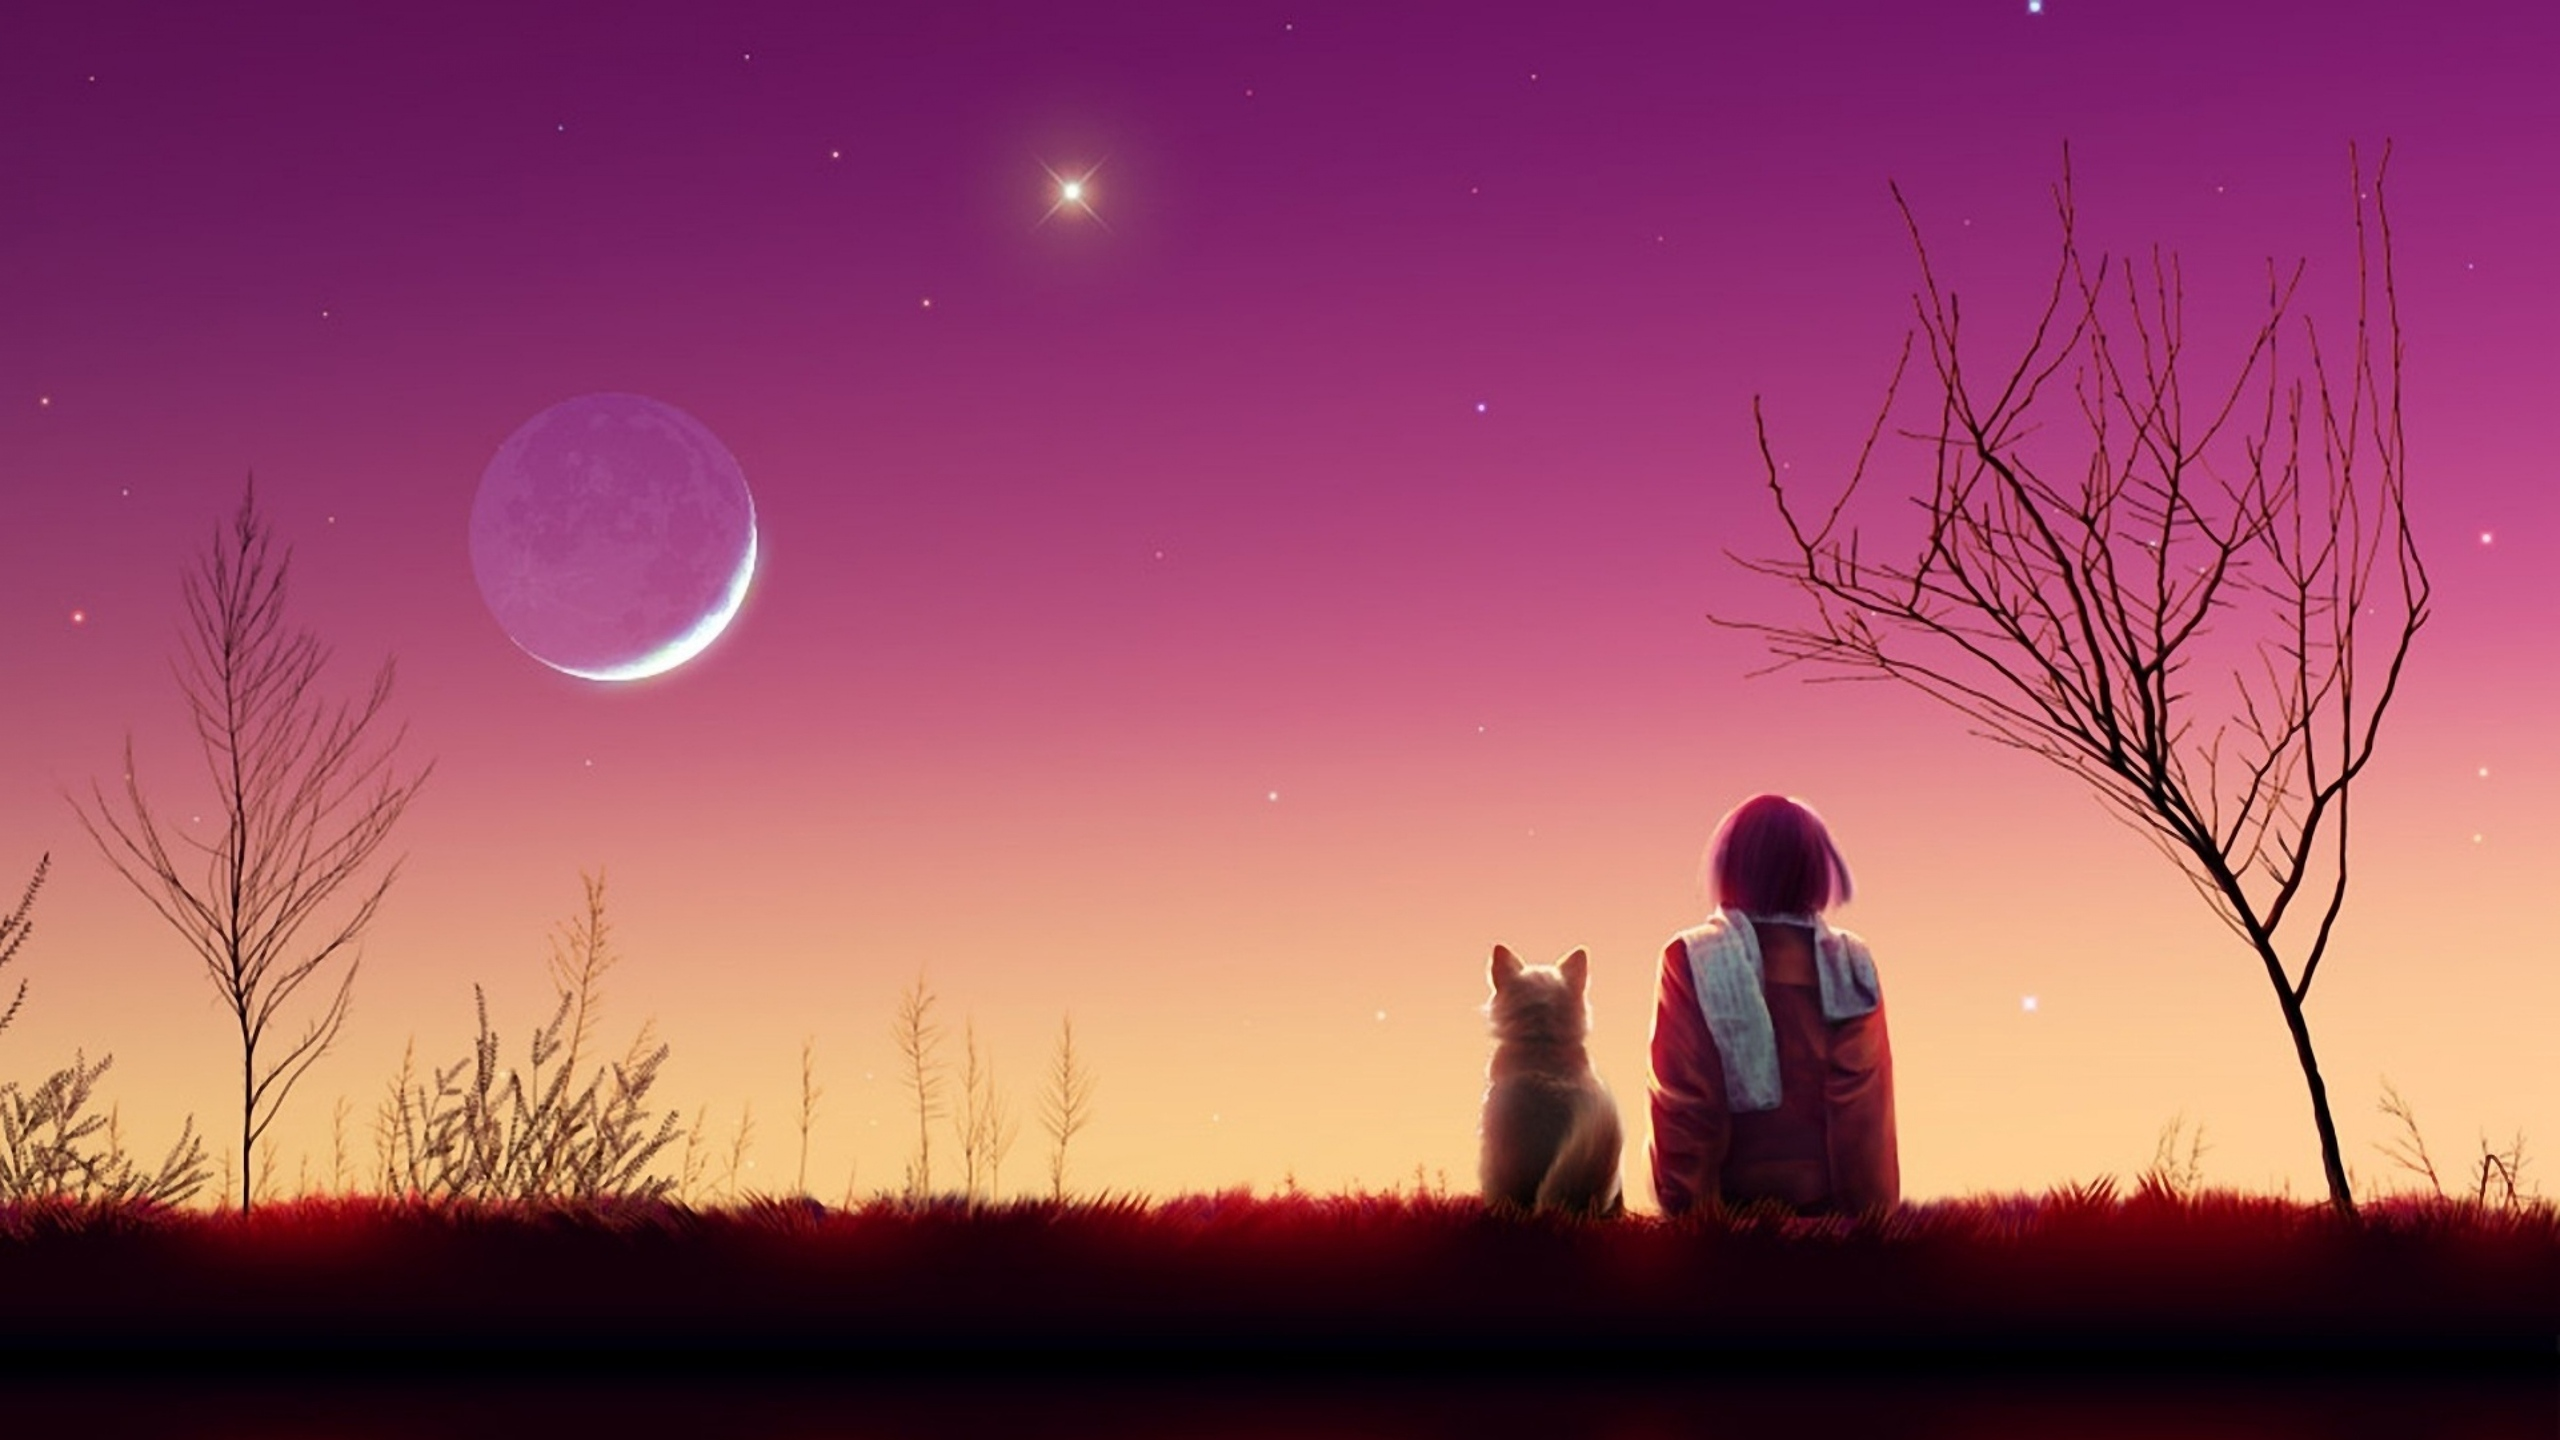 2560x1440 Anime Girl Sunset 1440P Resolution HD 4k Wallpapers